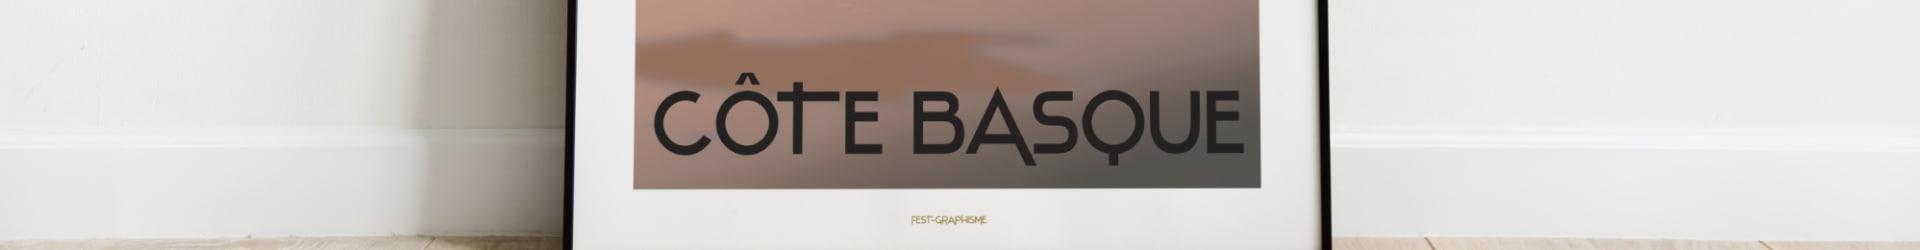 Morning Surf – Côte Basque – Affiche